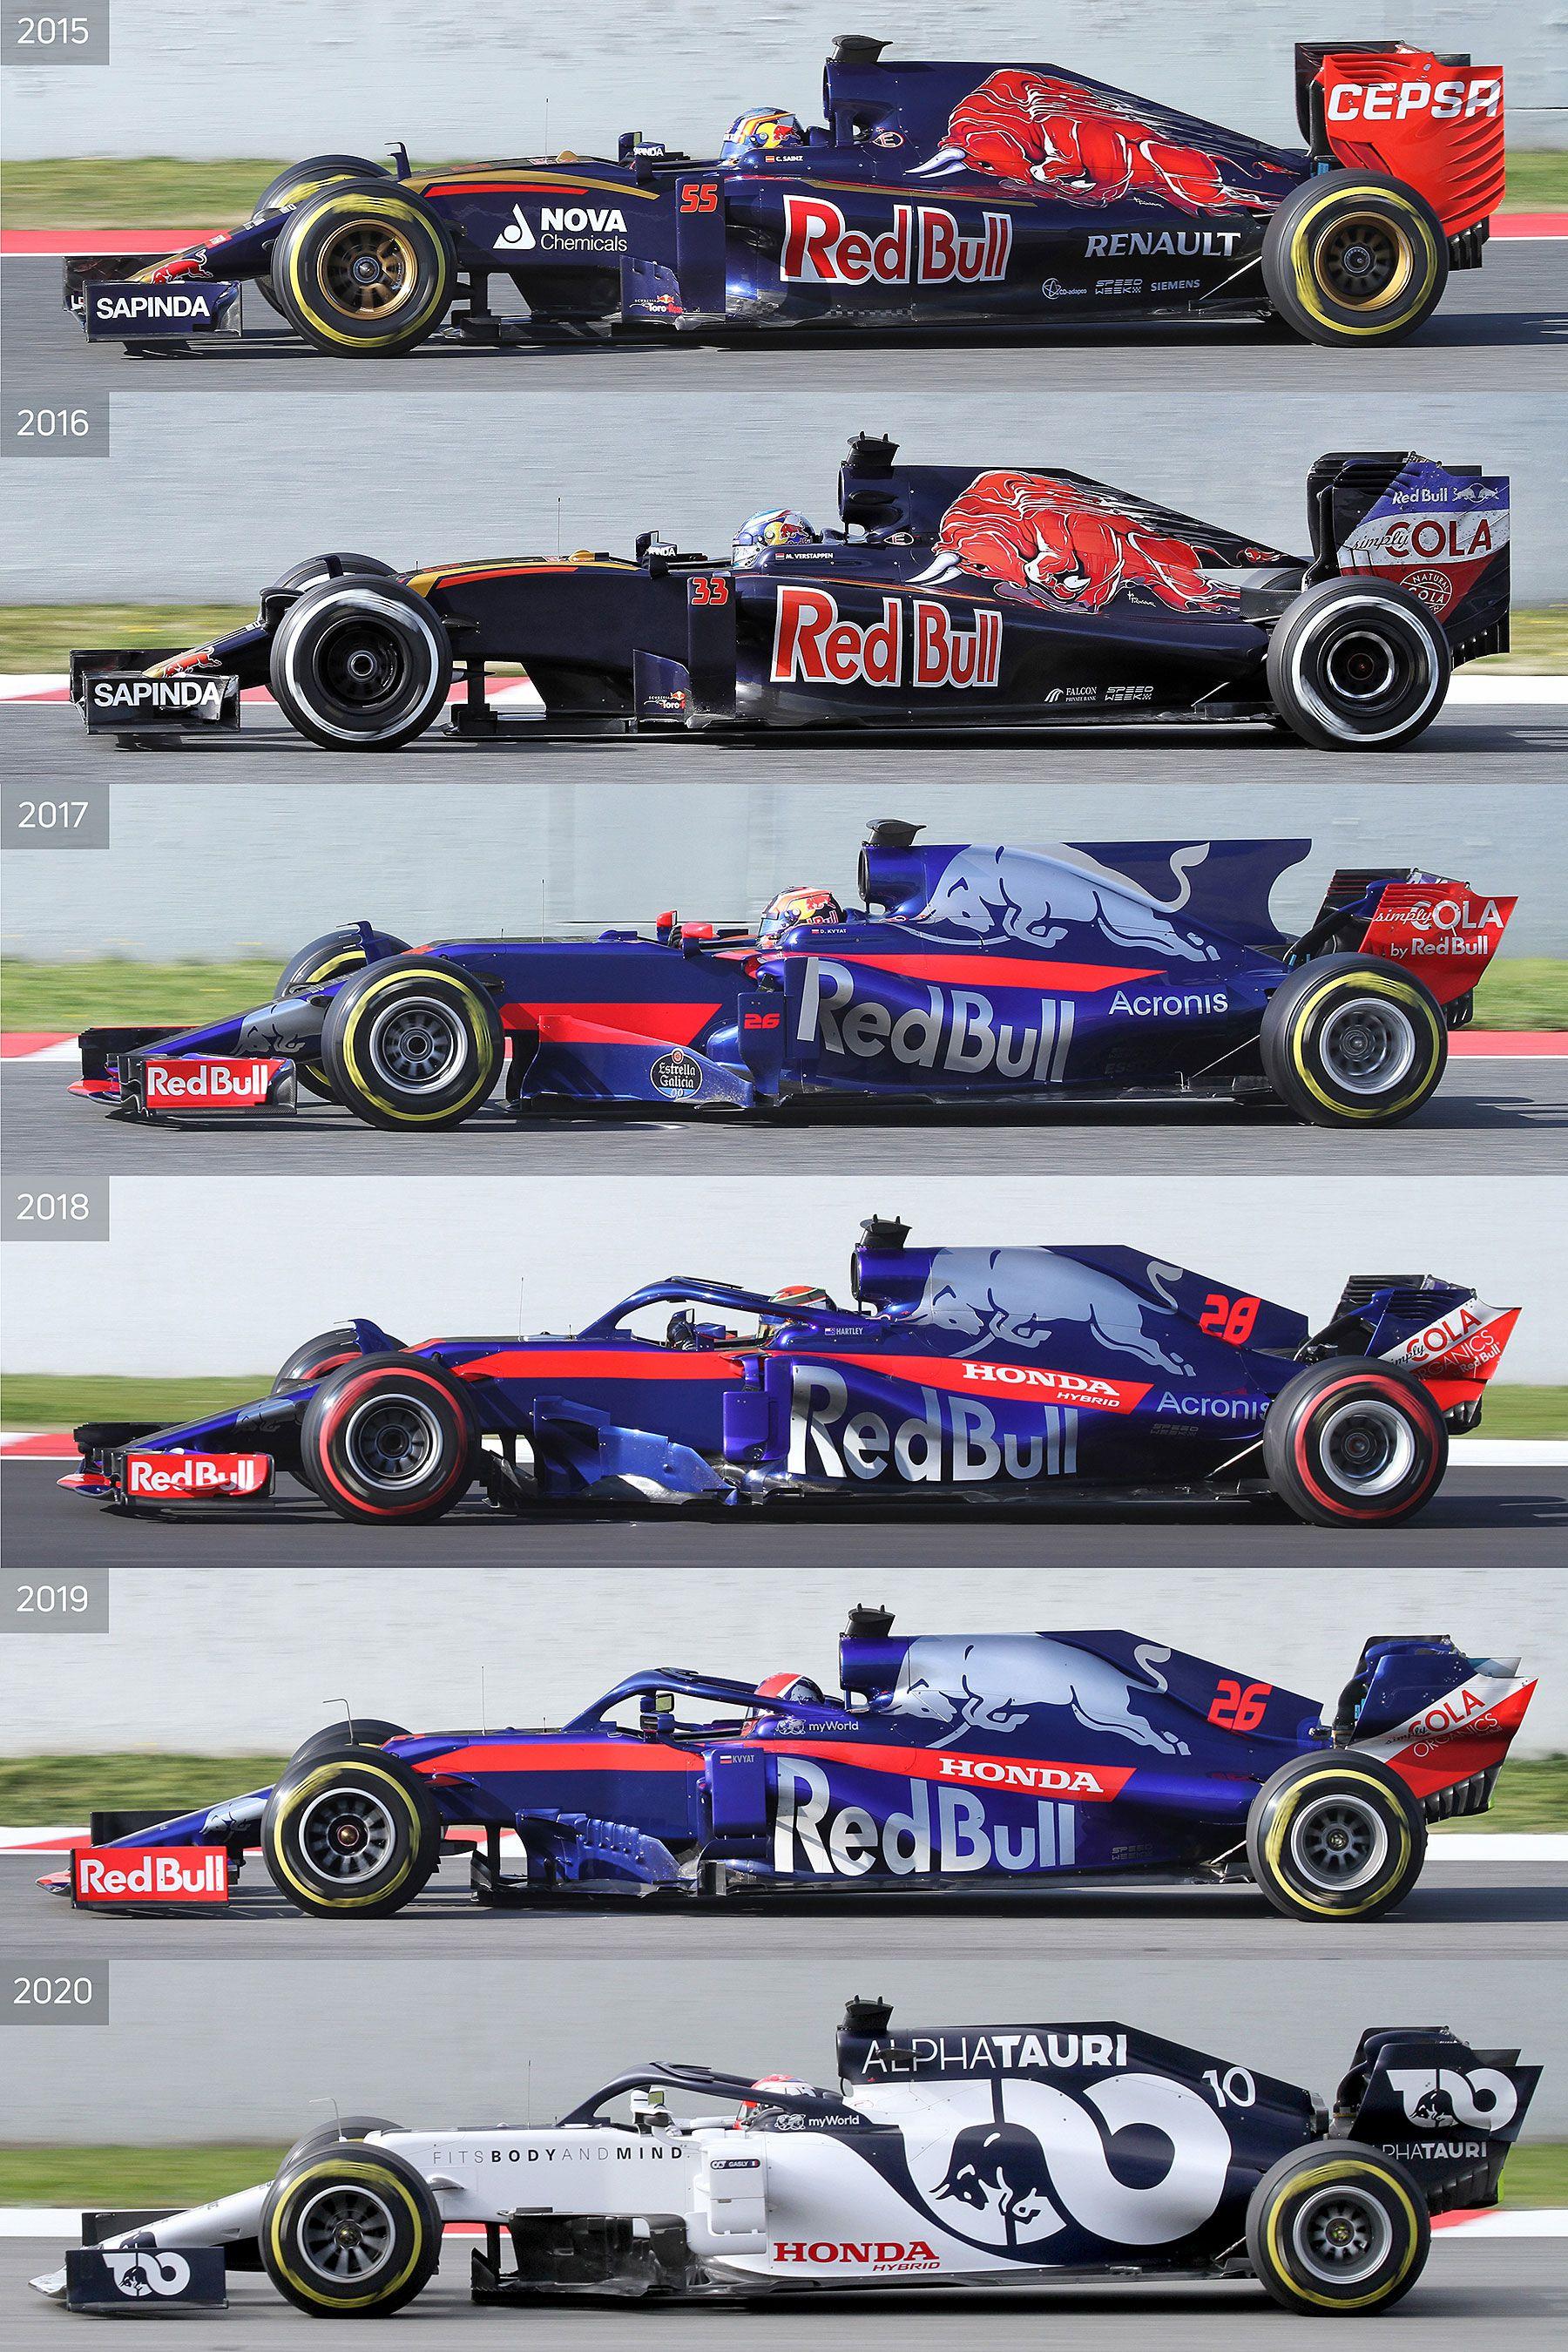 Barcelona Formula 1 Testing 2020 Day 4 5 6 Technical Analysis Carsten Riede Fotografie In 2020 Formula 1 Car Formula 1 Car Racing Formula Racing